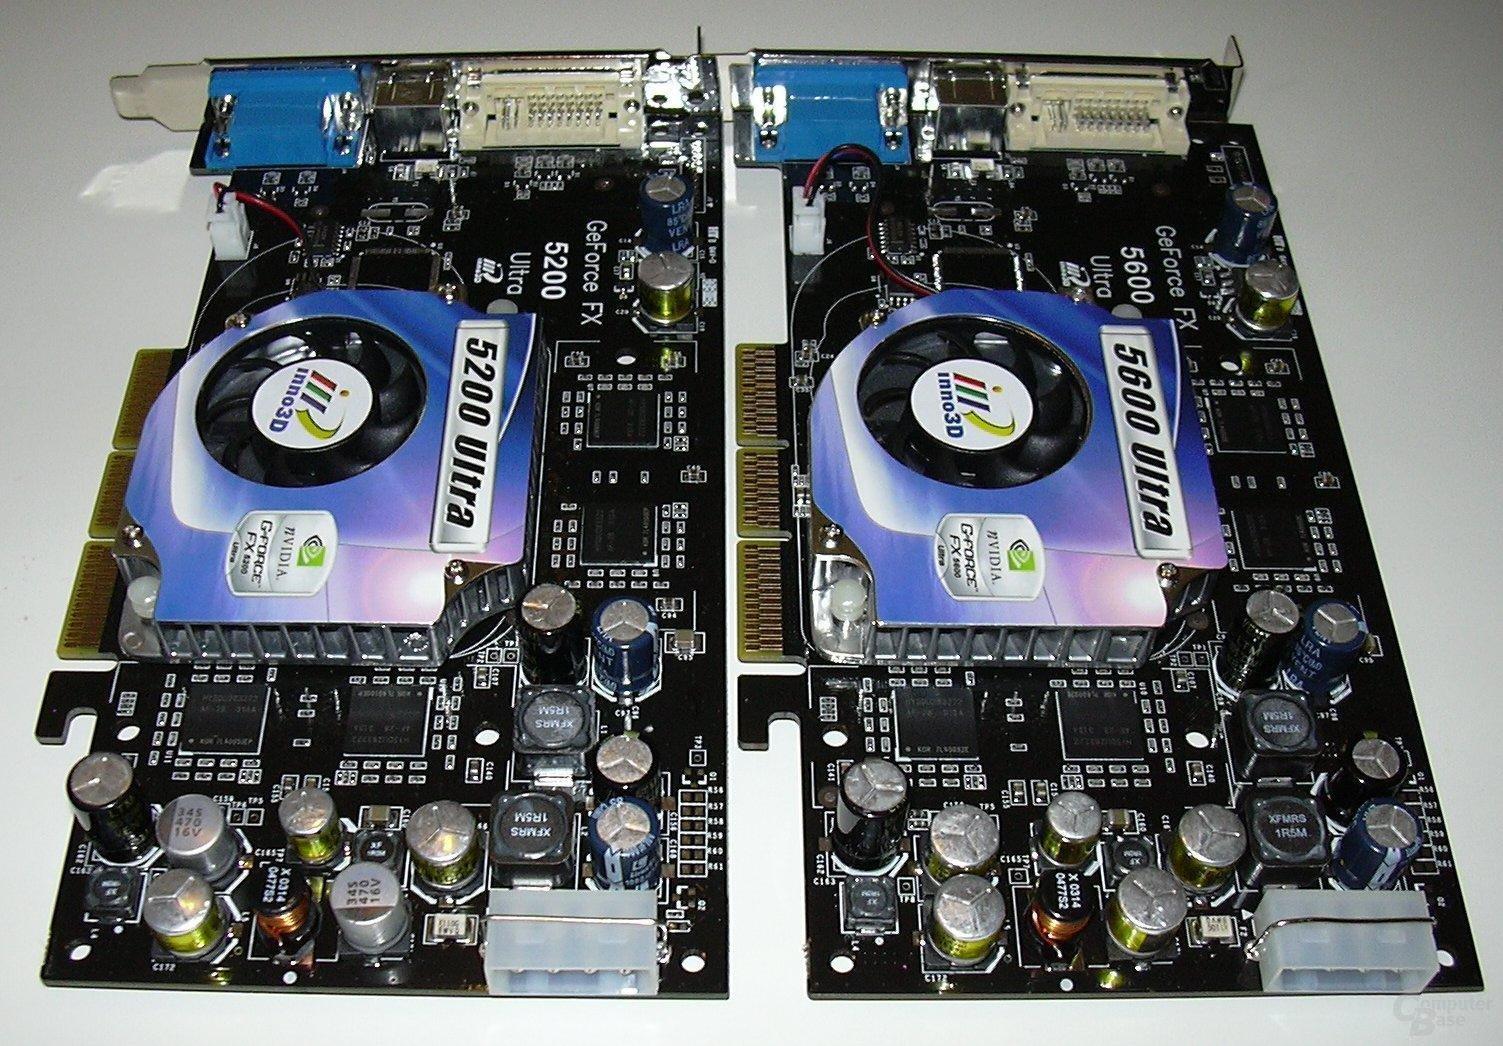 FX5200u vs. FX5600u II